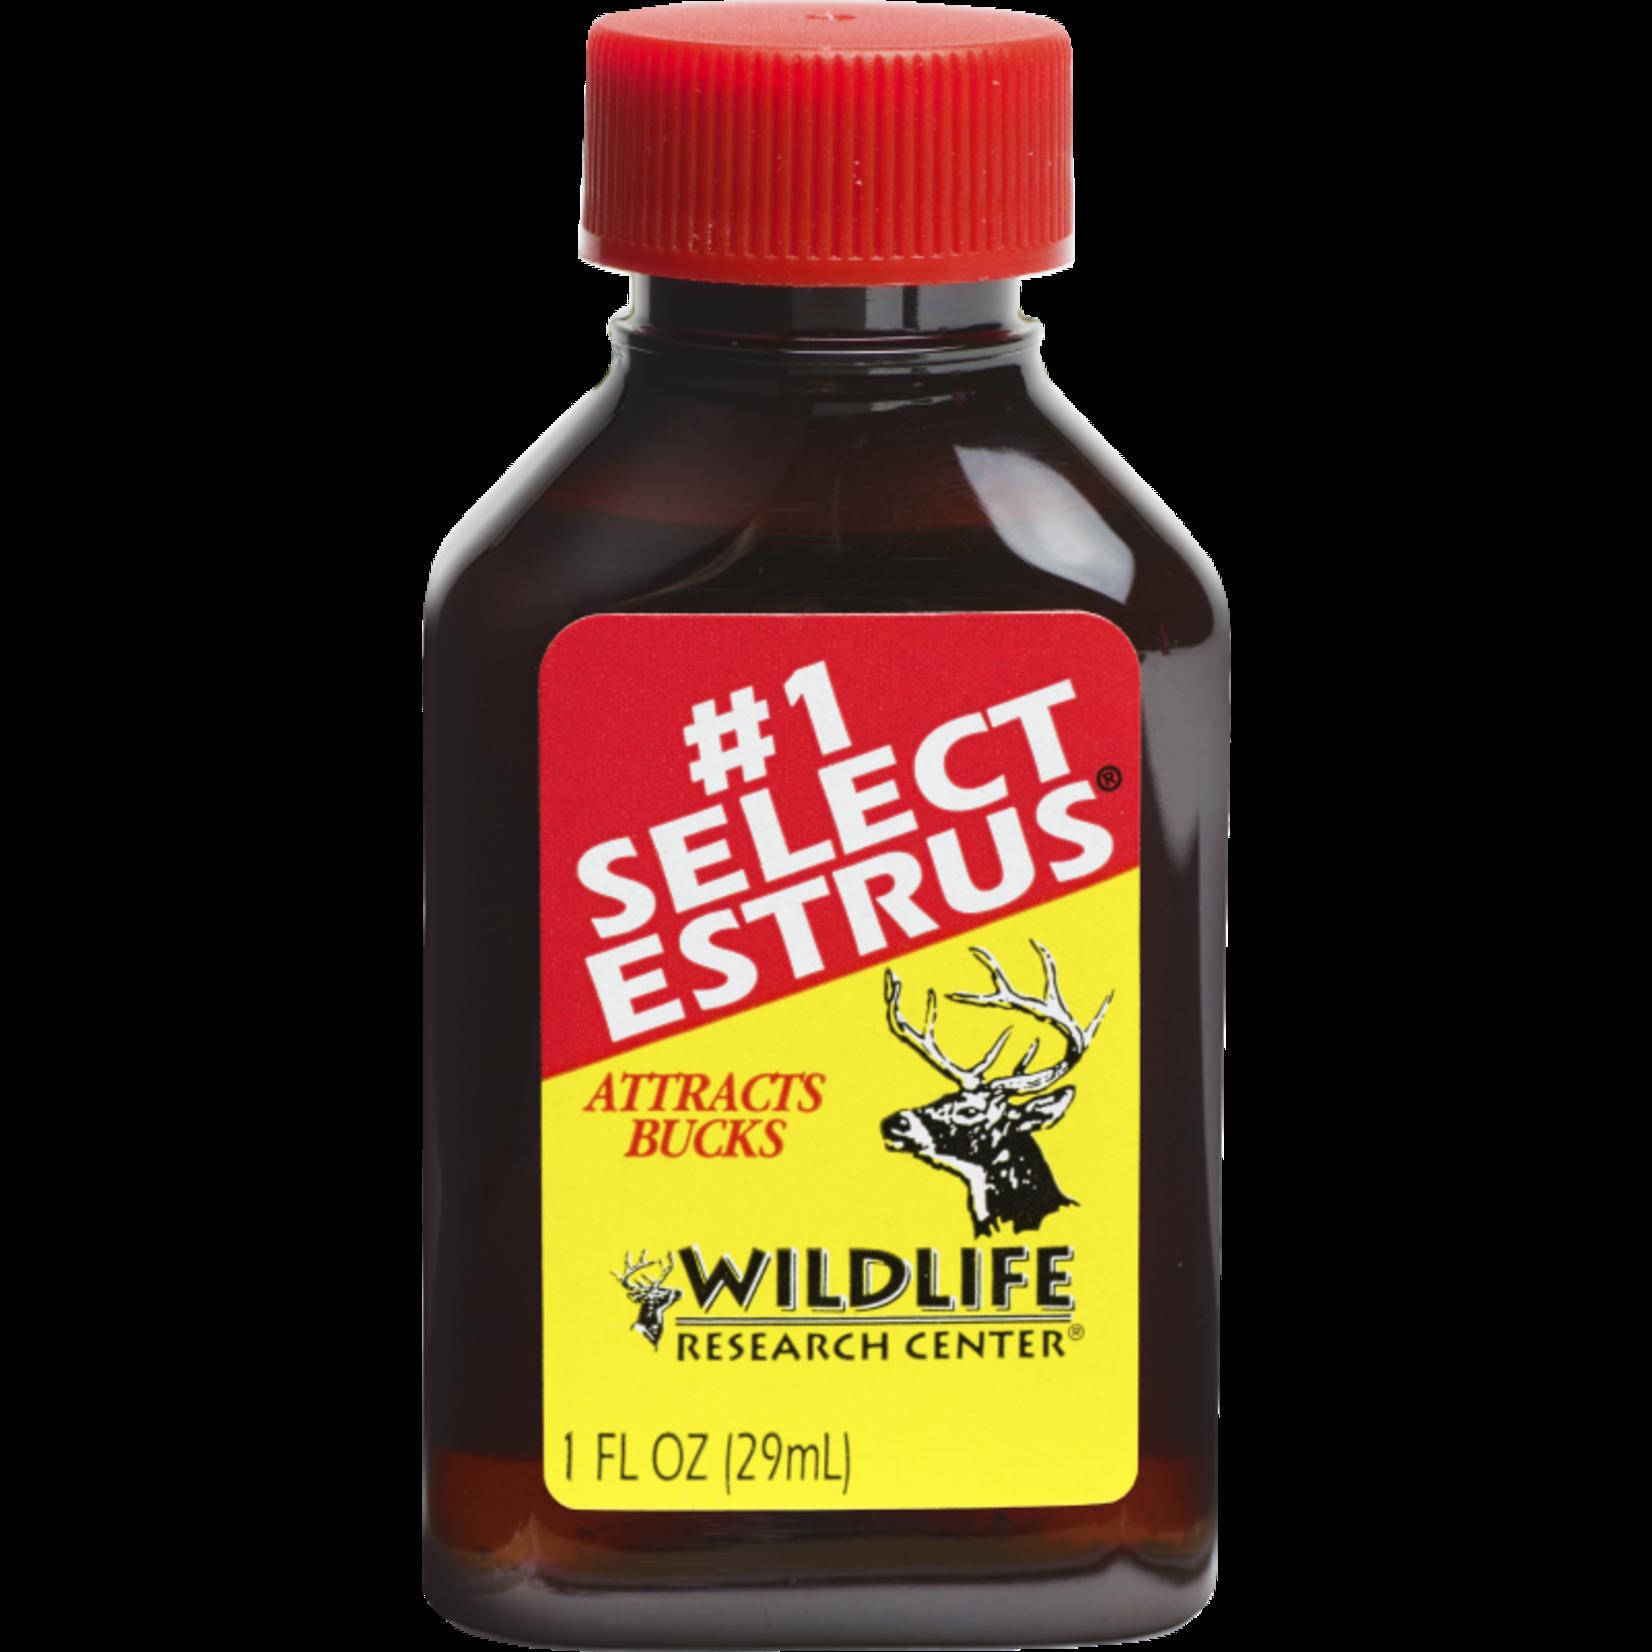 Wildlife Research Center #1 Select Estrus     4 Oz Fl